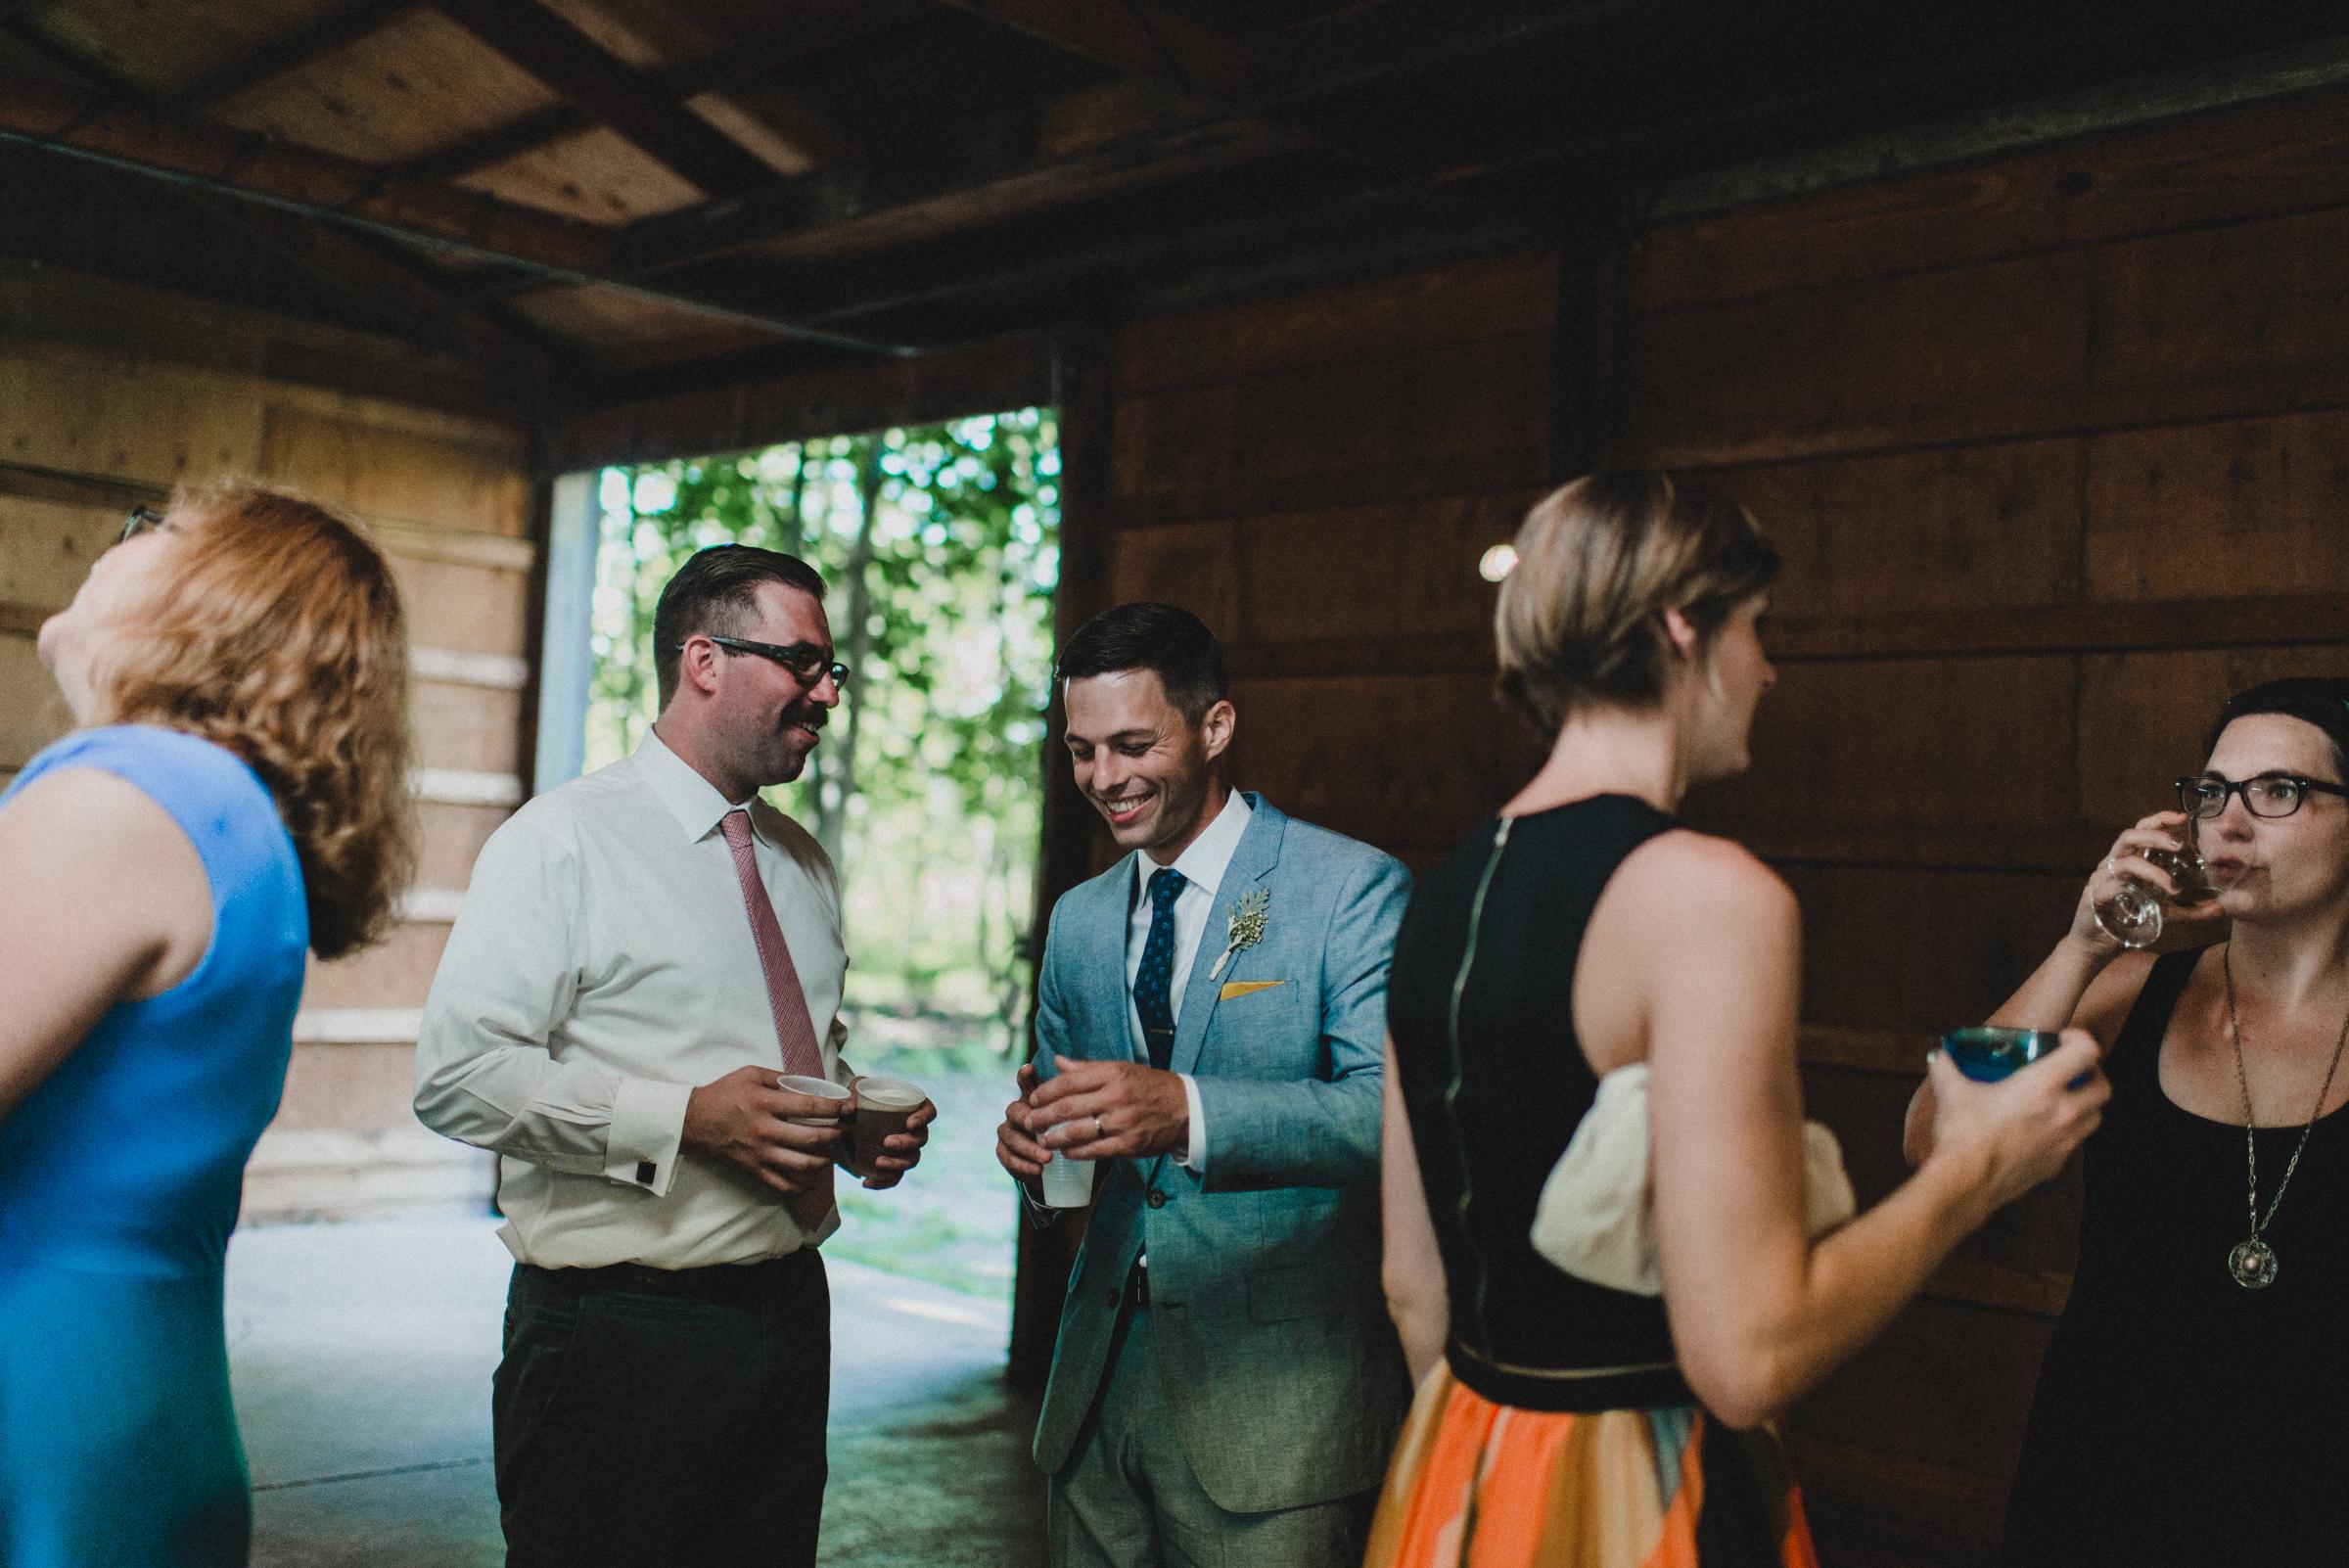 Intimate-Backyard-Farmhouse-Ohio-Wedding-Andi+Ben_Mallory+Justin-Photographers-184.JPG